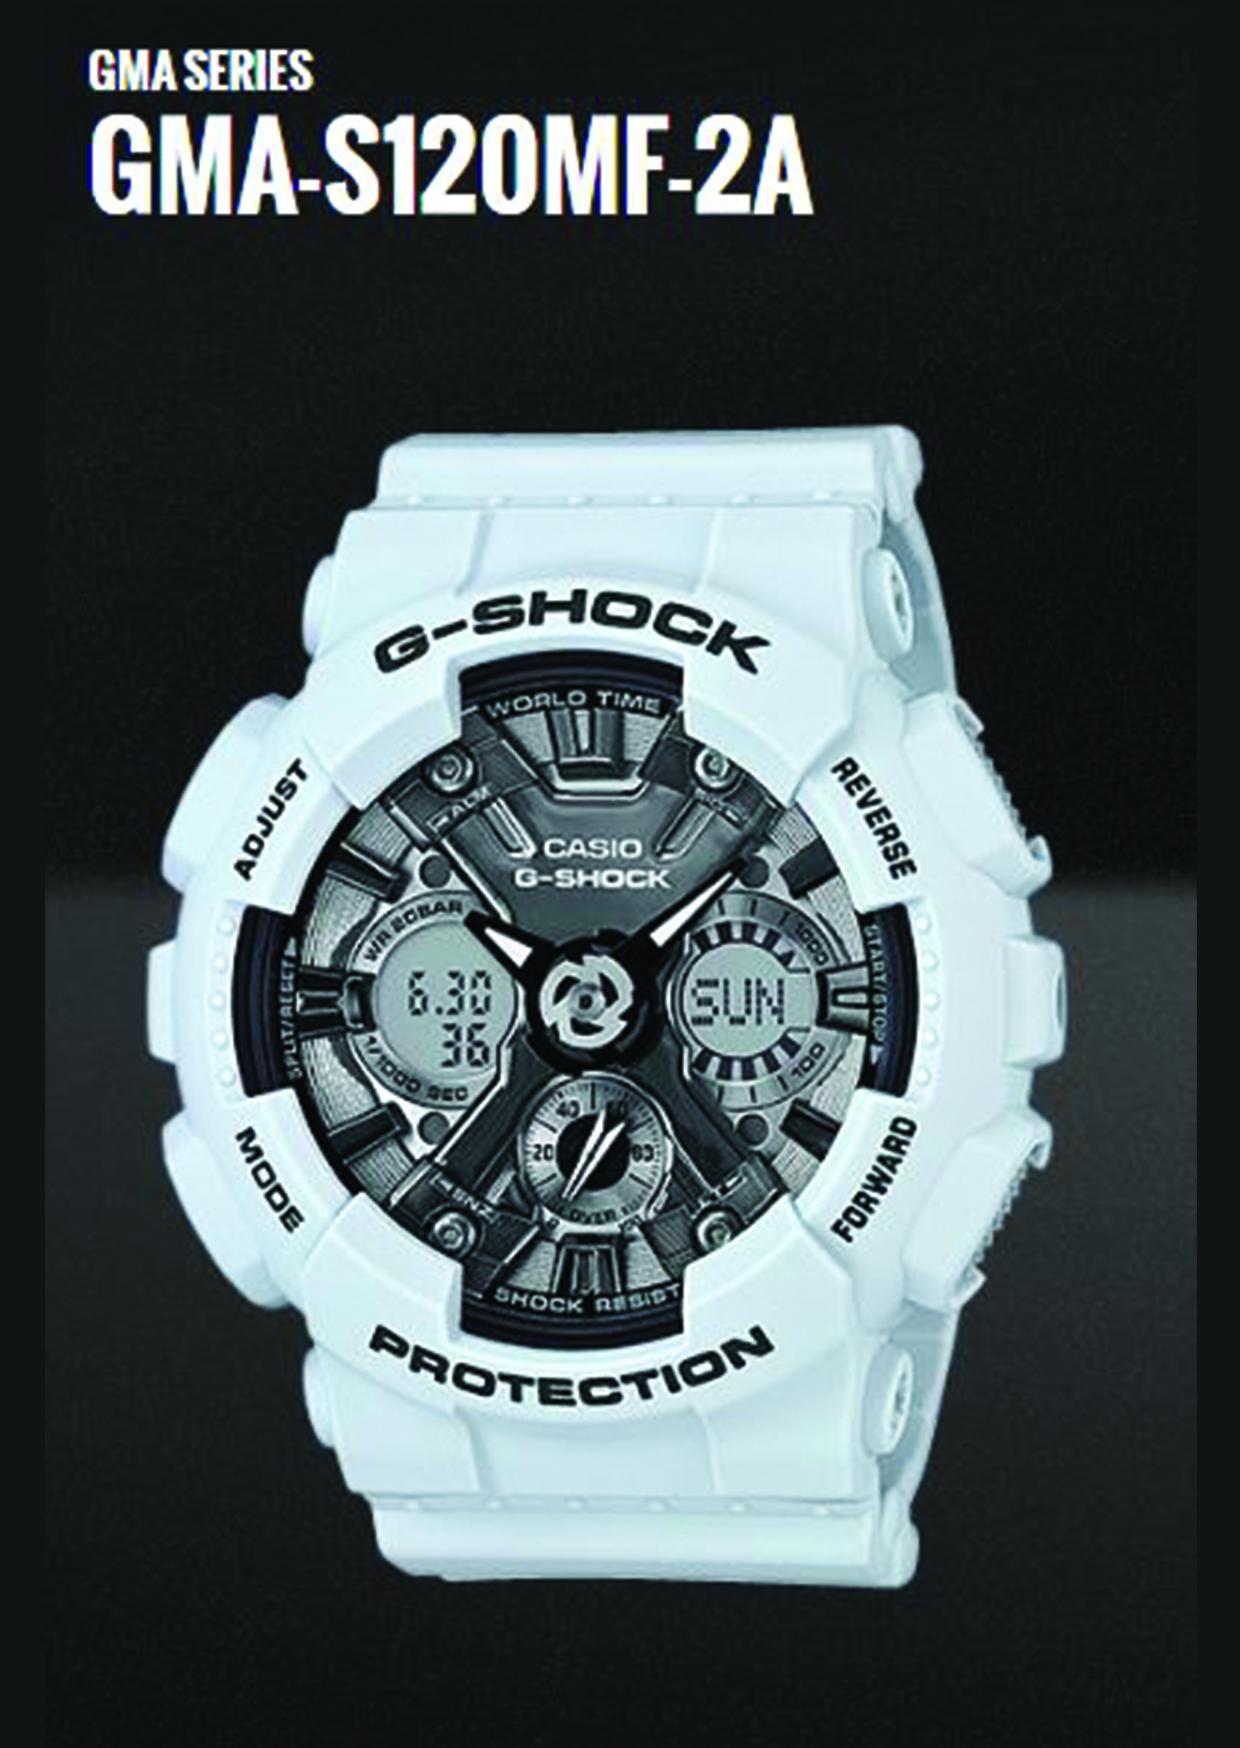 Timepieces Jostyle Boutique Casio G Shock Gma S120mf 7a2 2a